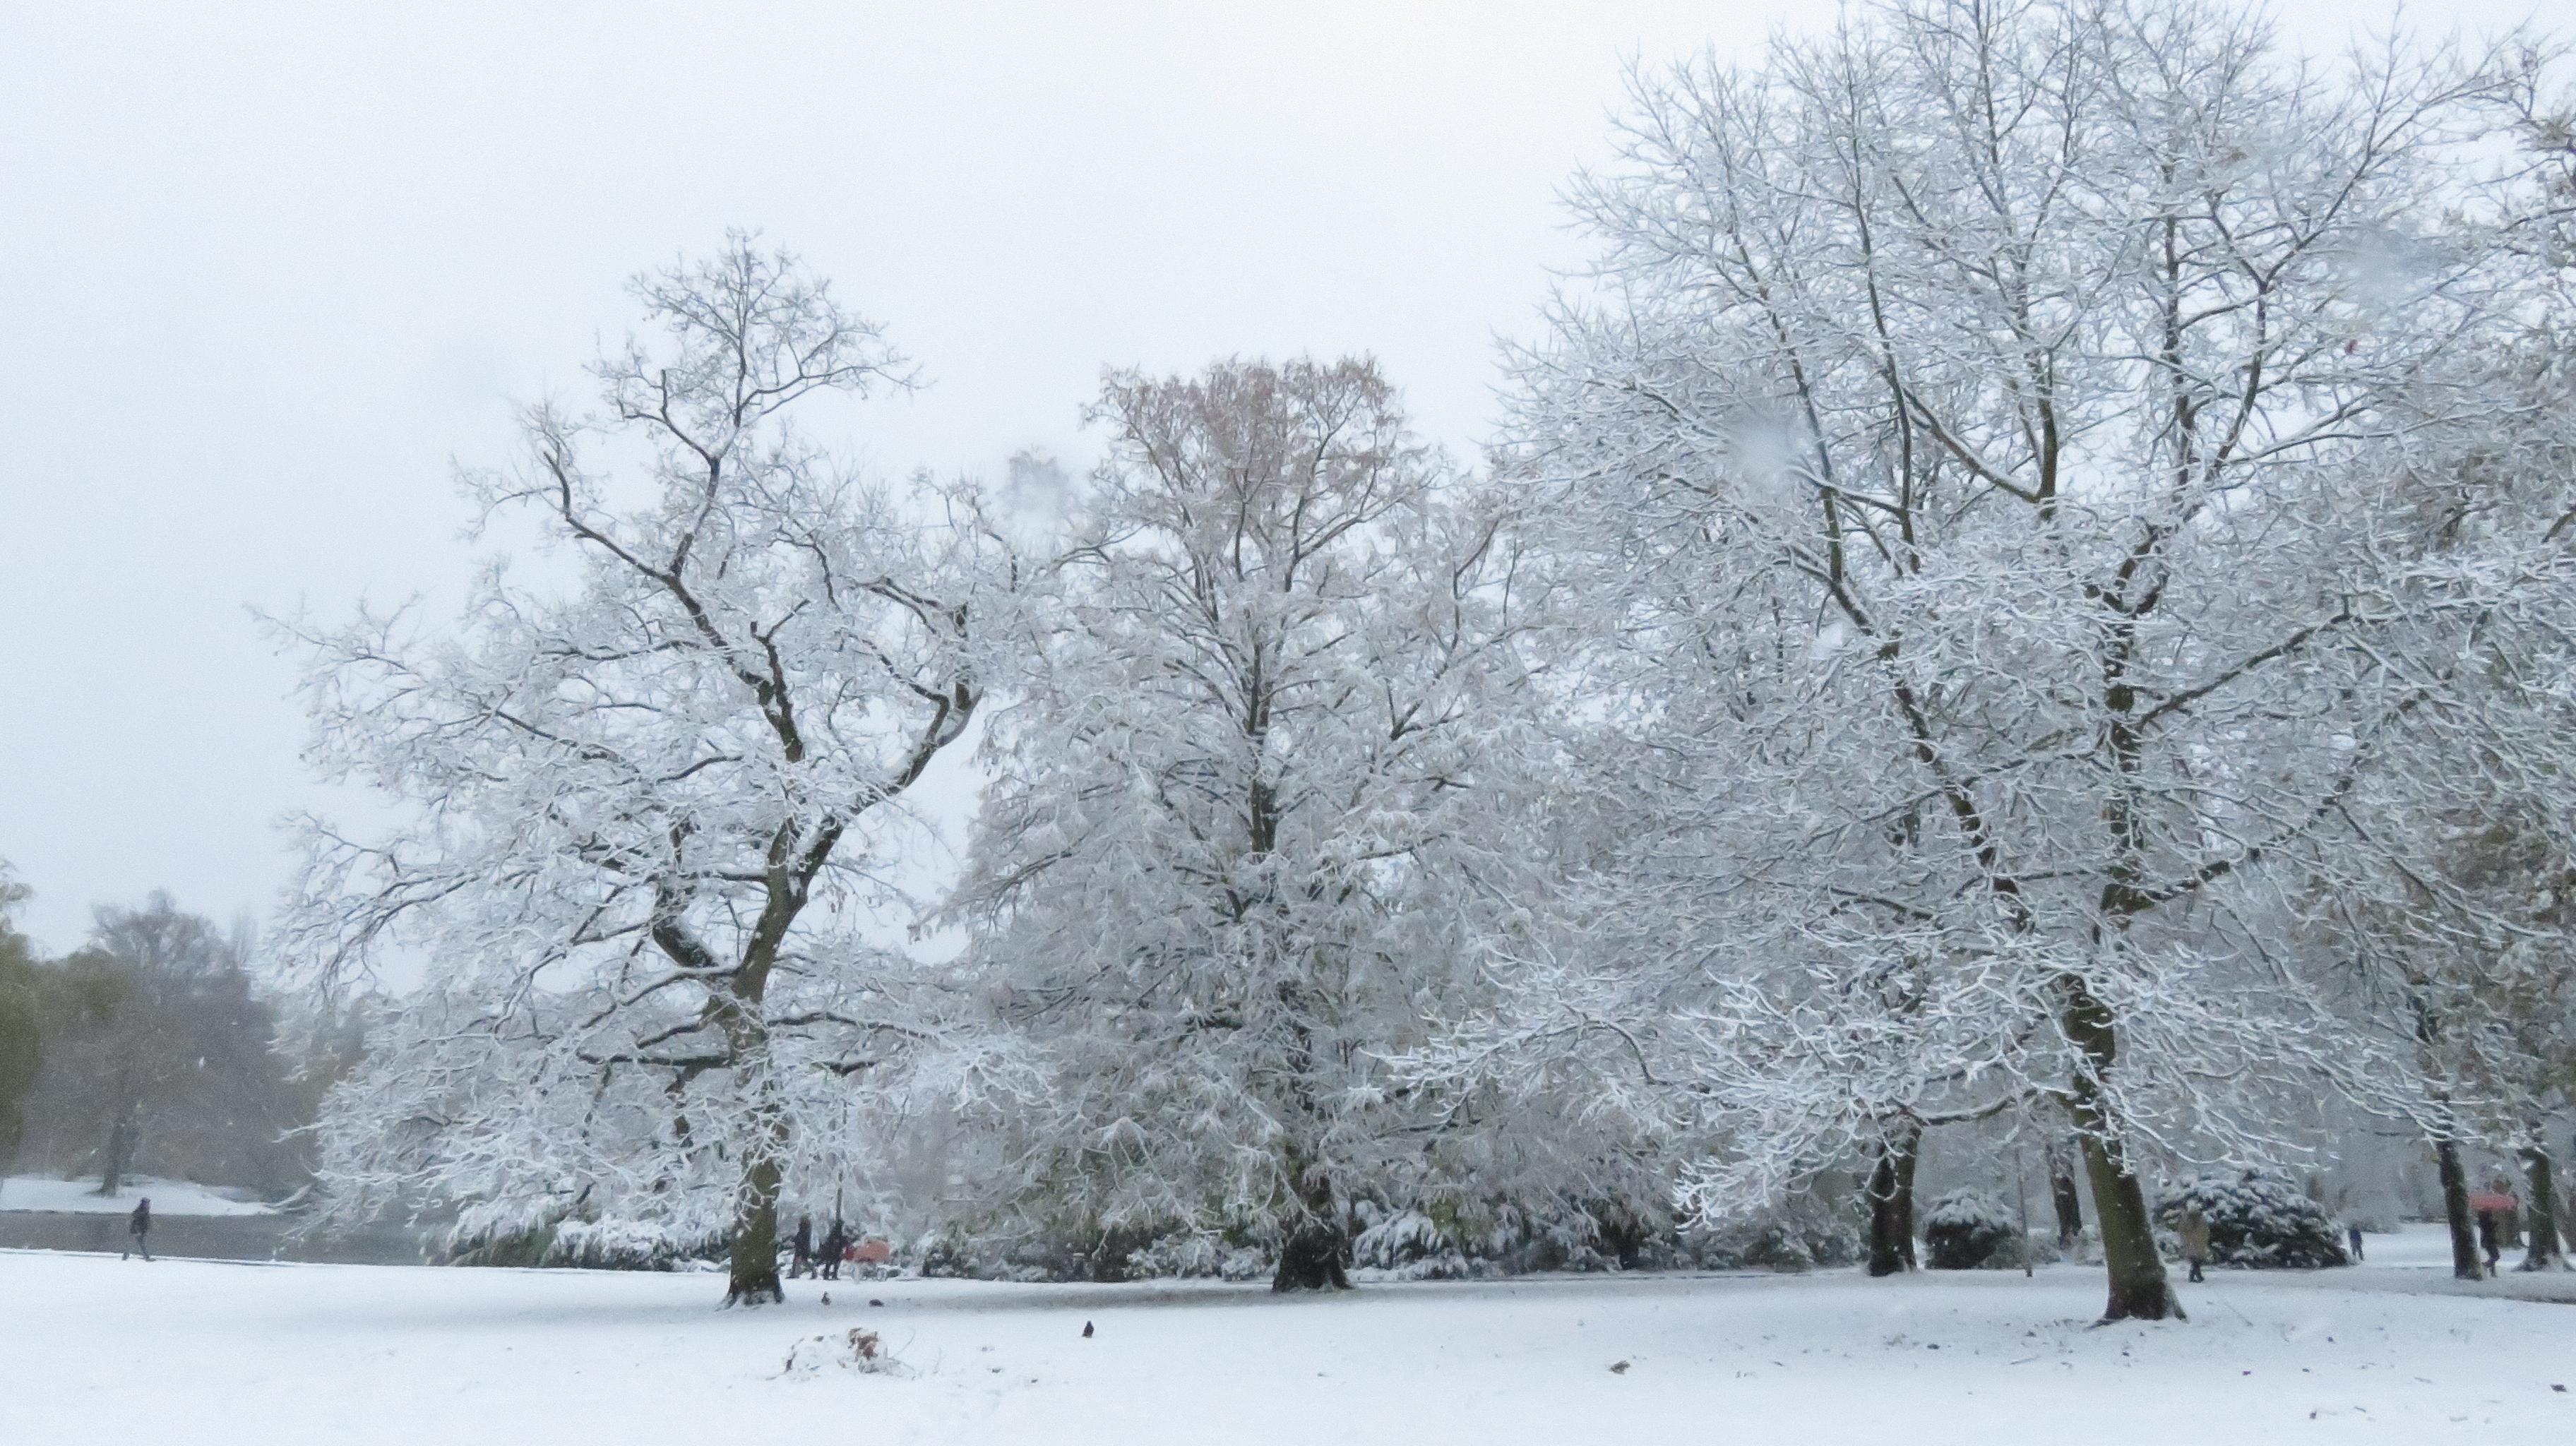 Neige à Kiel, Schrevenpark